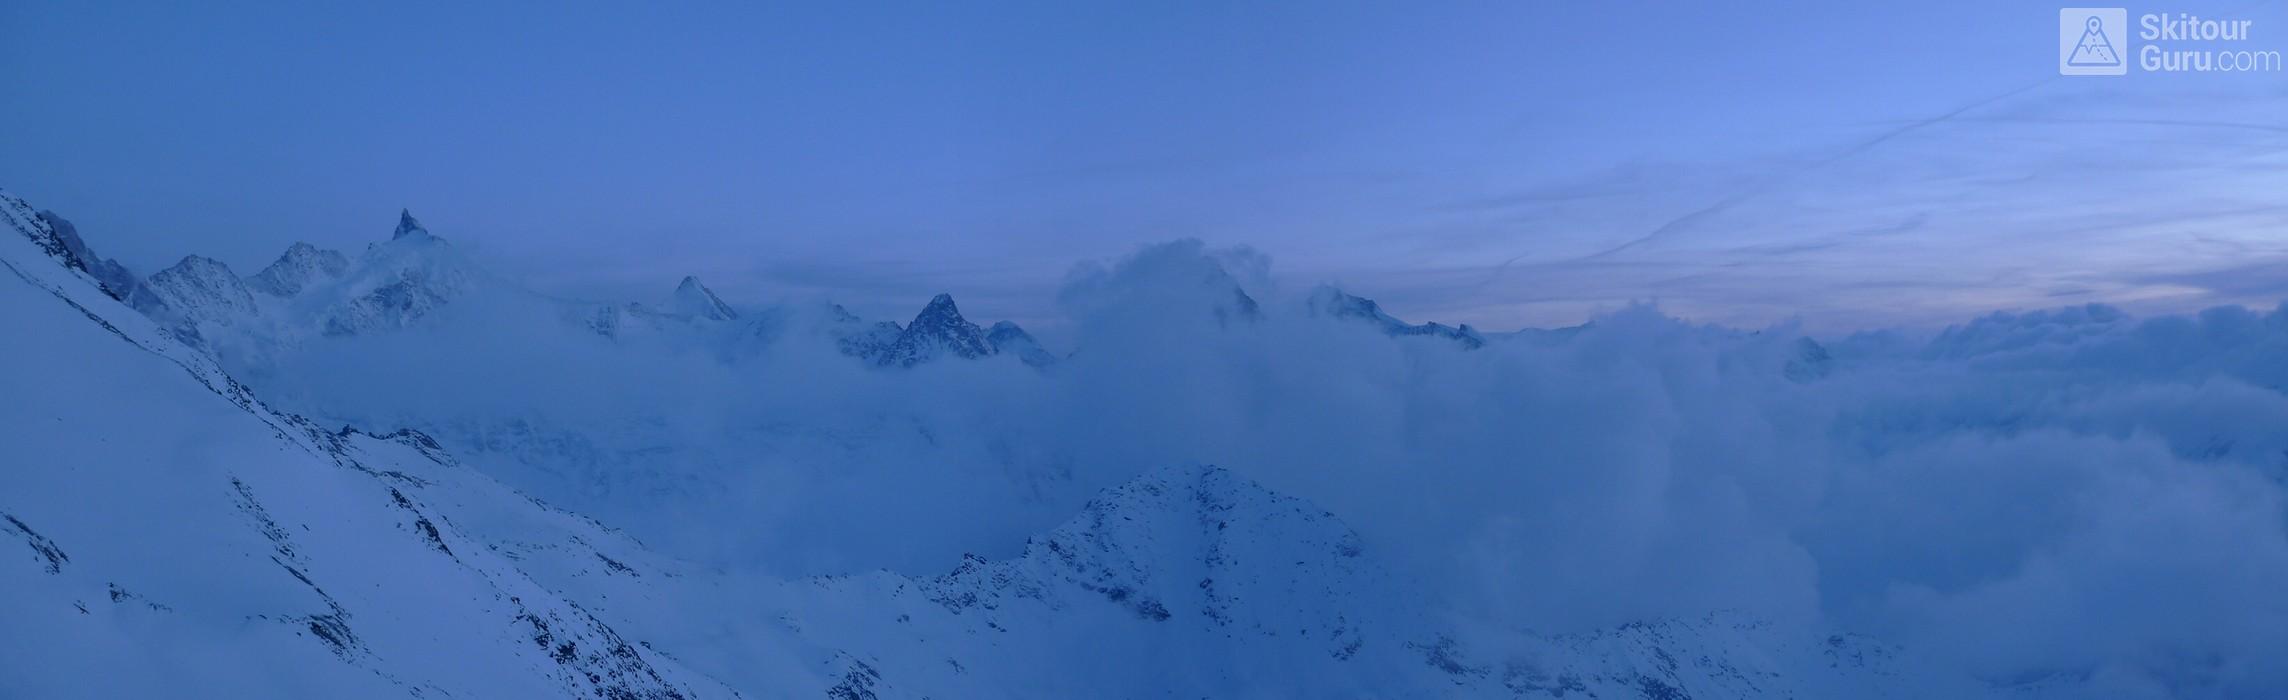 Cabane Tracuit Walliser Alpen / Alpes valaisannes Švýcarsko panorama 22